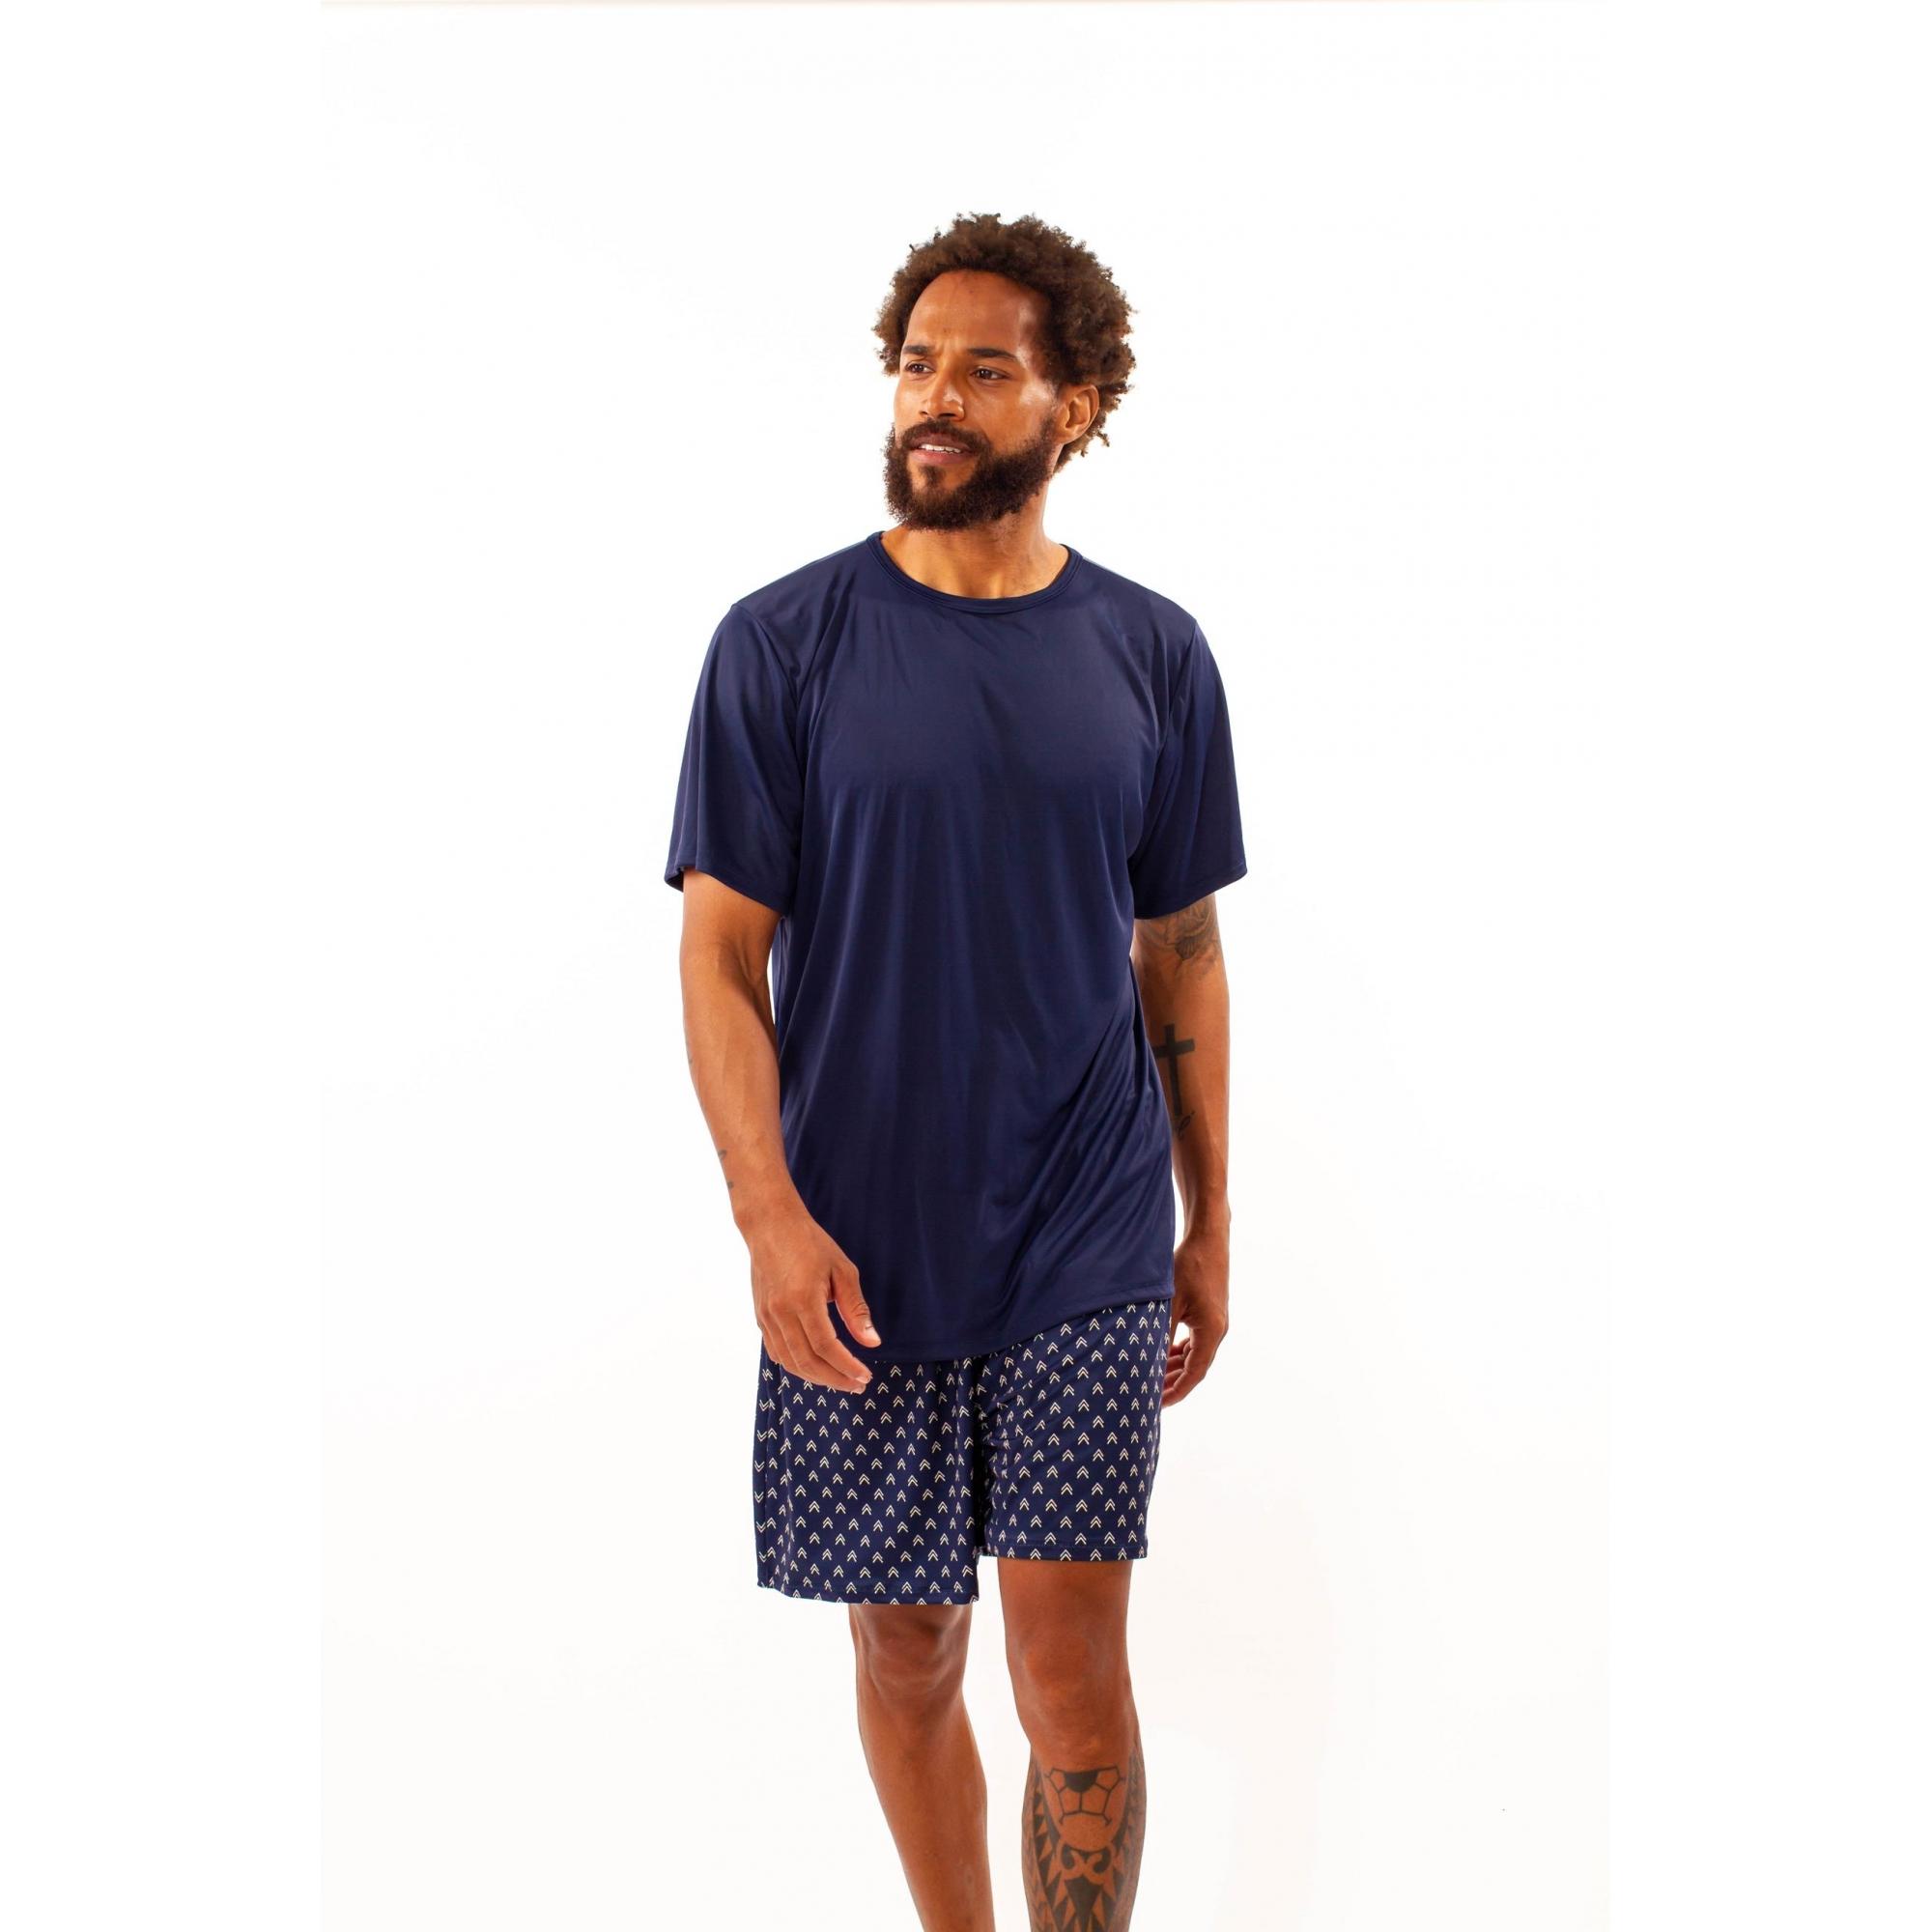 Pijama curto masculino em liganete - 81